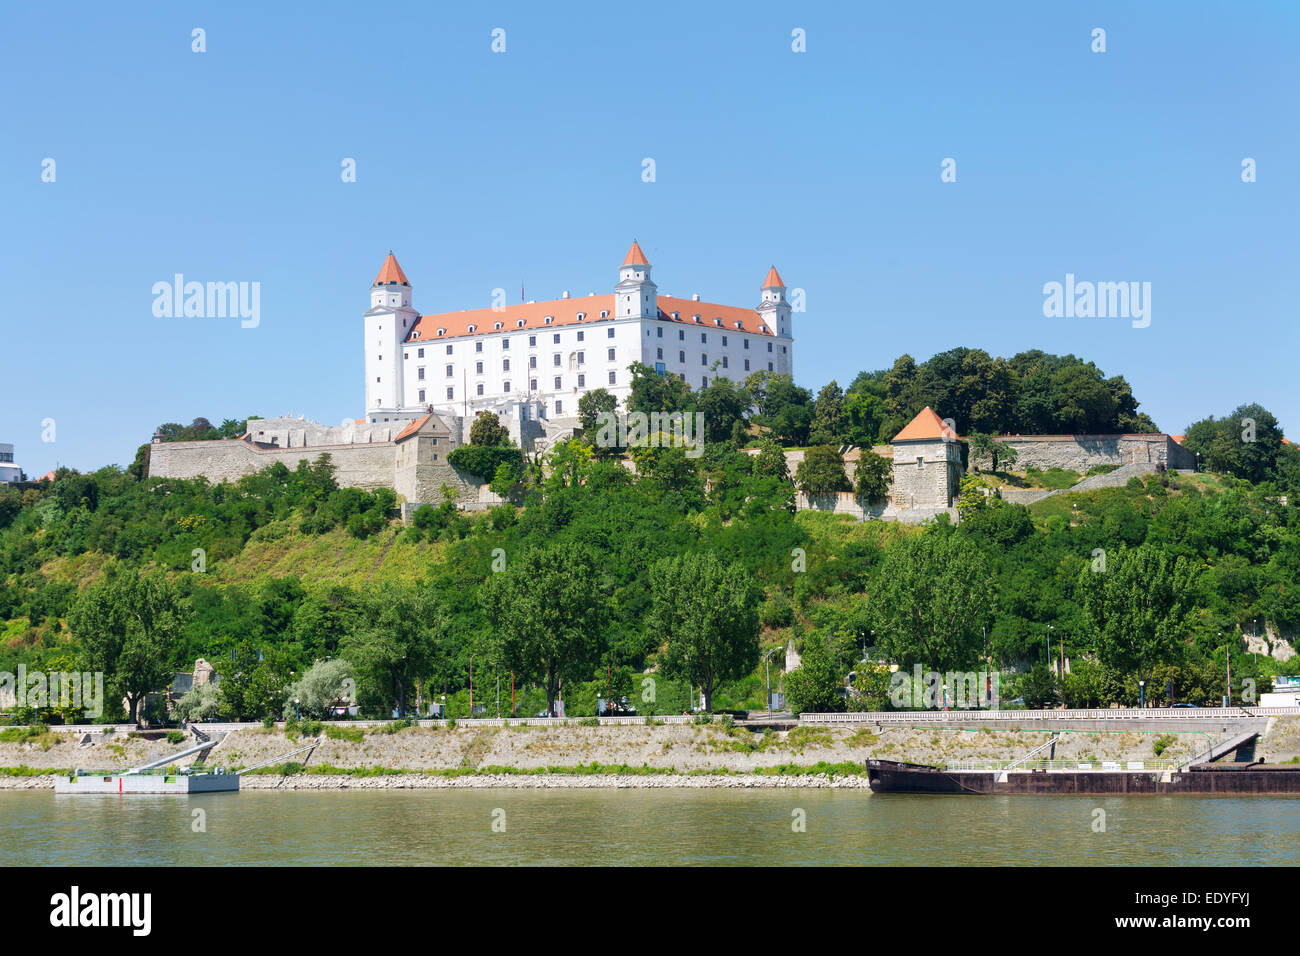 Medieval castle on the hill against the sky, Bratislava, Slovakia - Stock Image